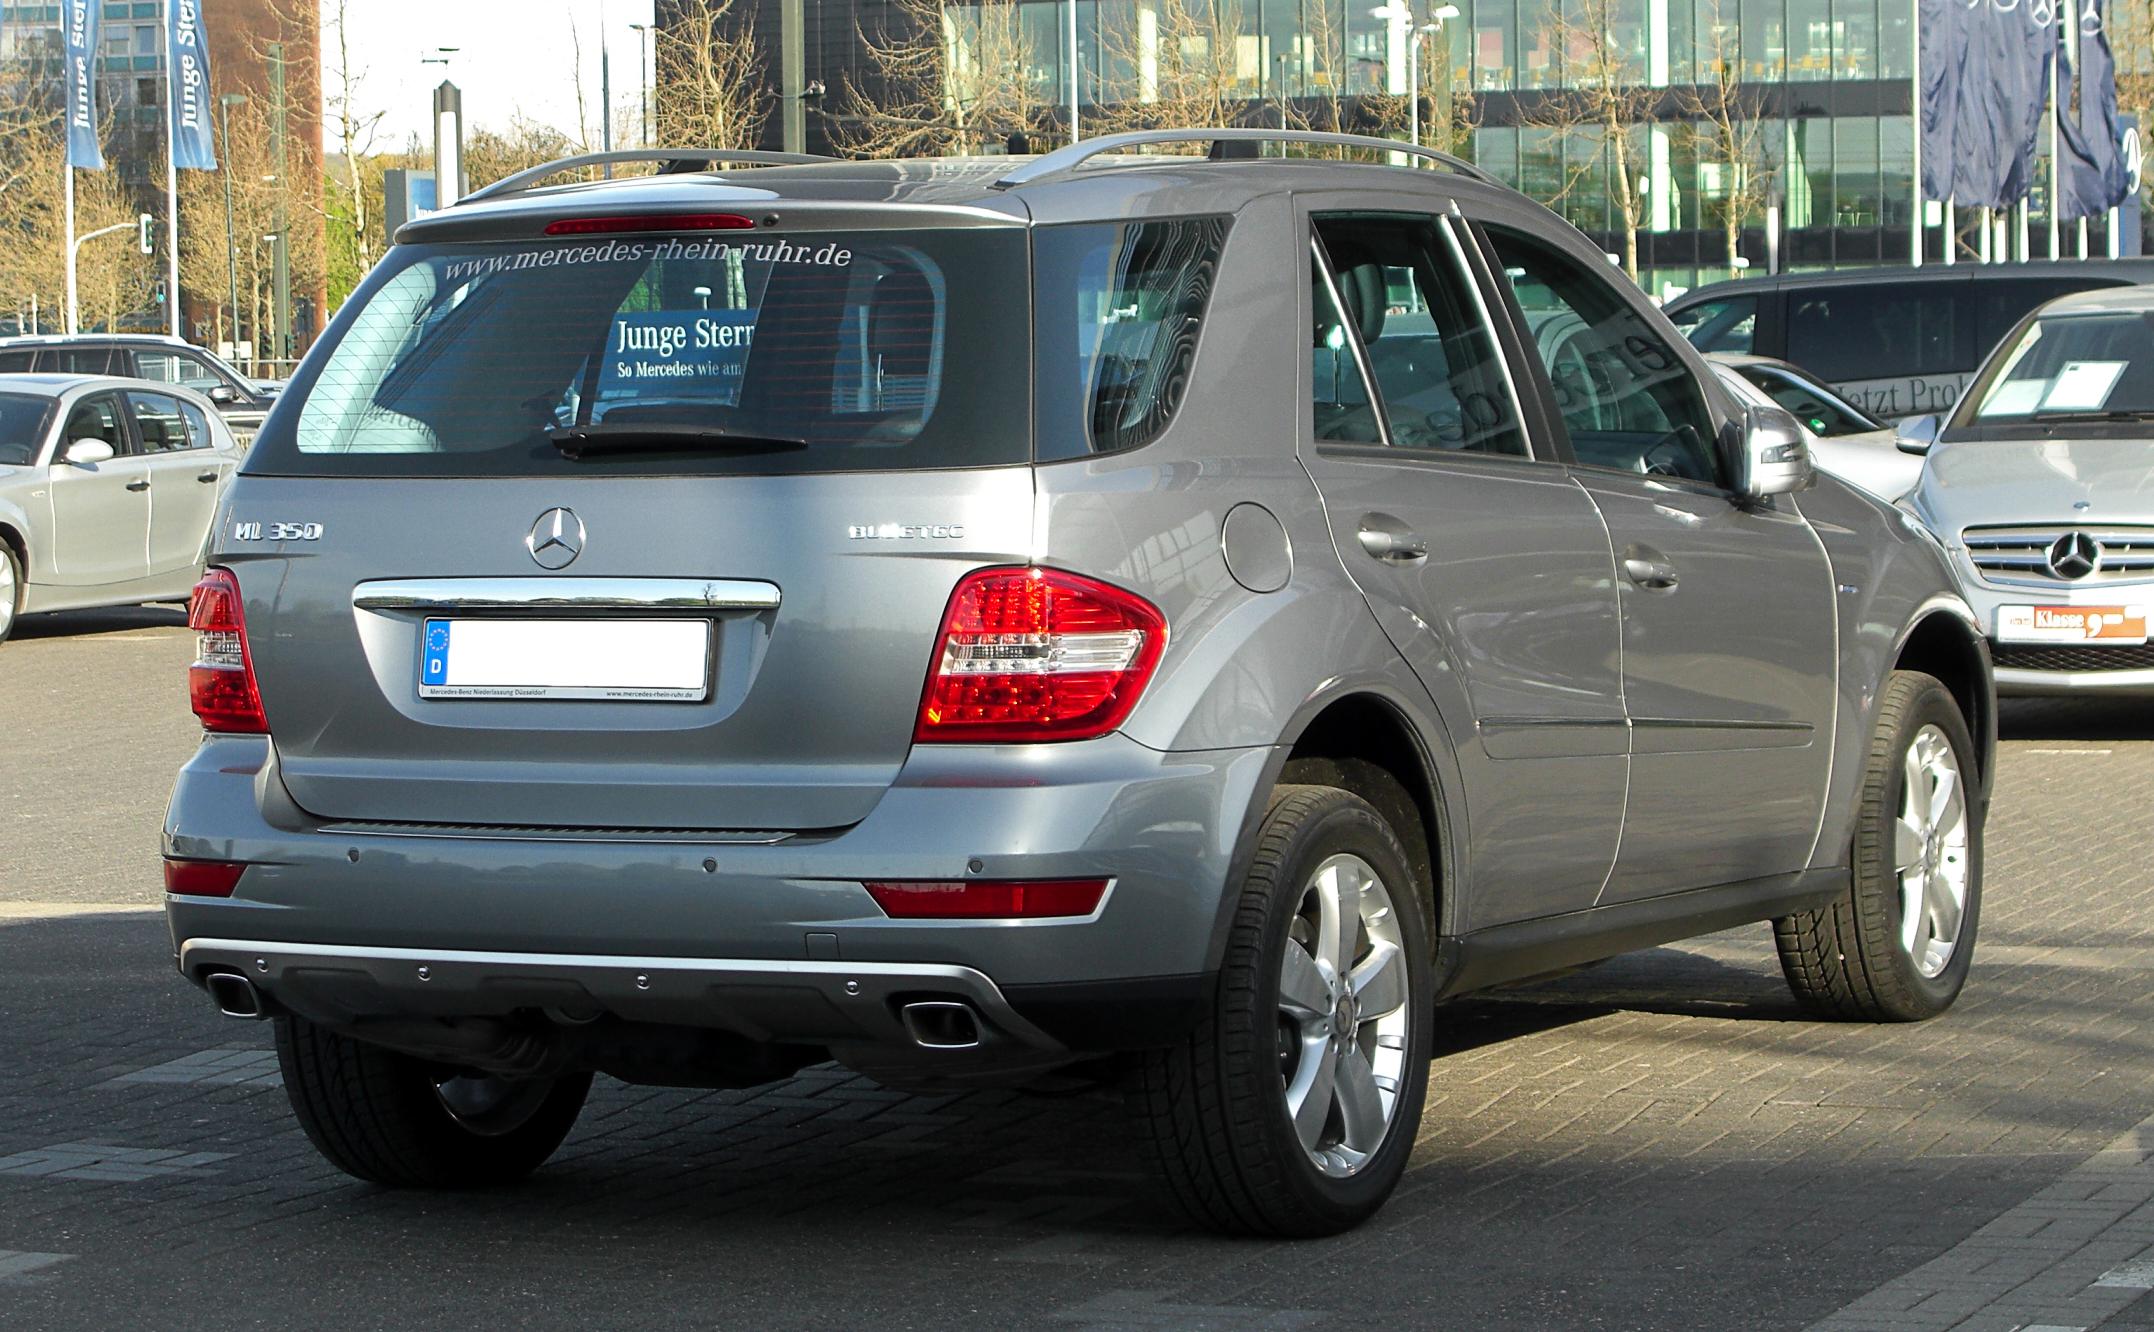 File:Mercedes-Benz ML 350 BlueTEC 4MATIC (W 164, Facelift ...